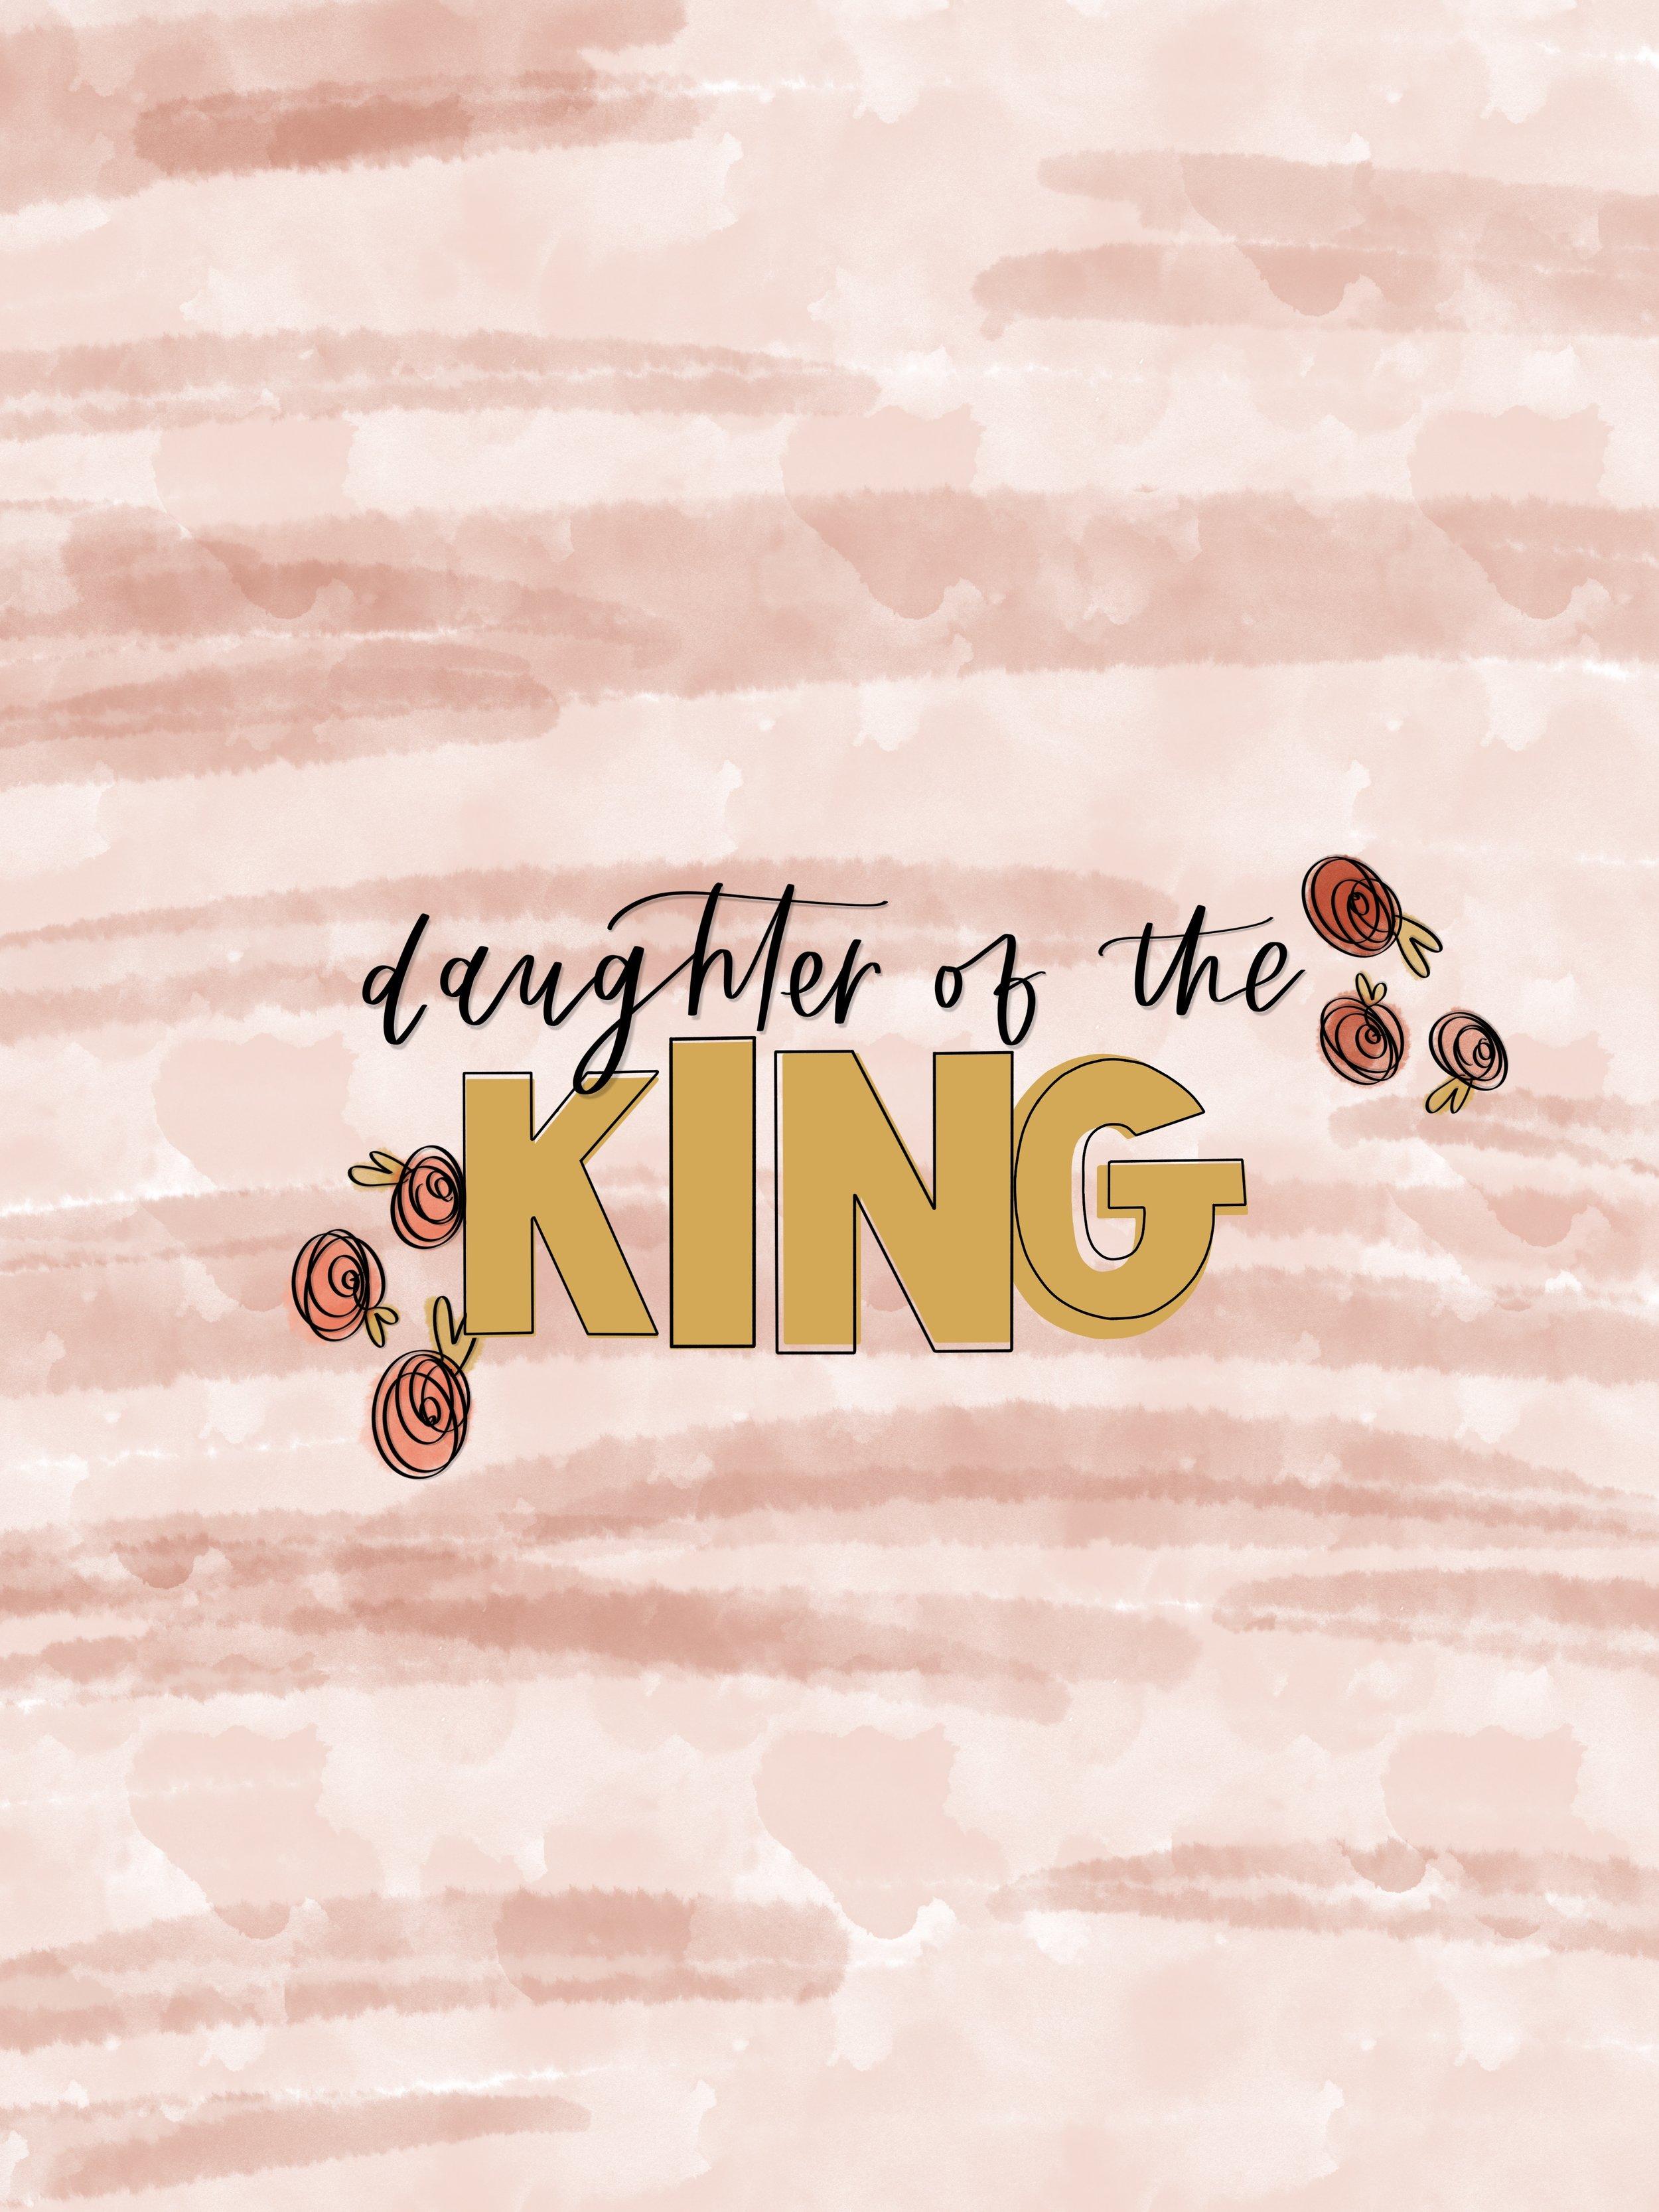 FWT daughter of King.jpg